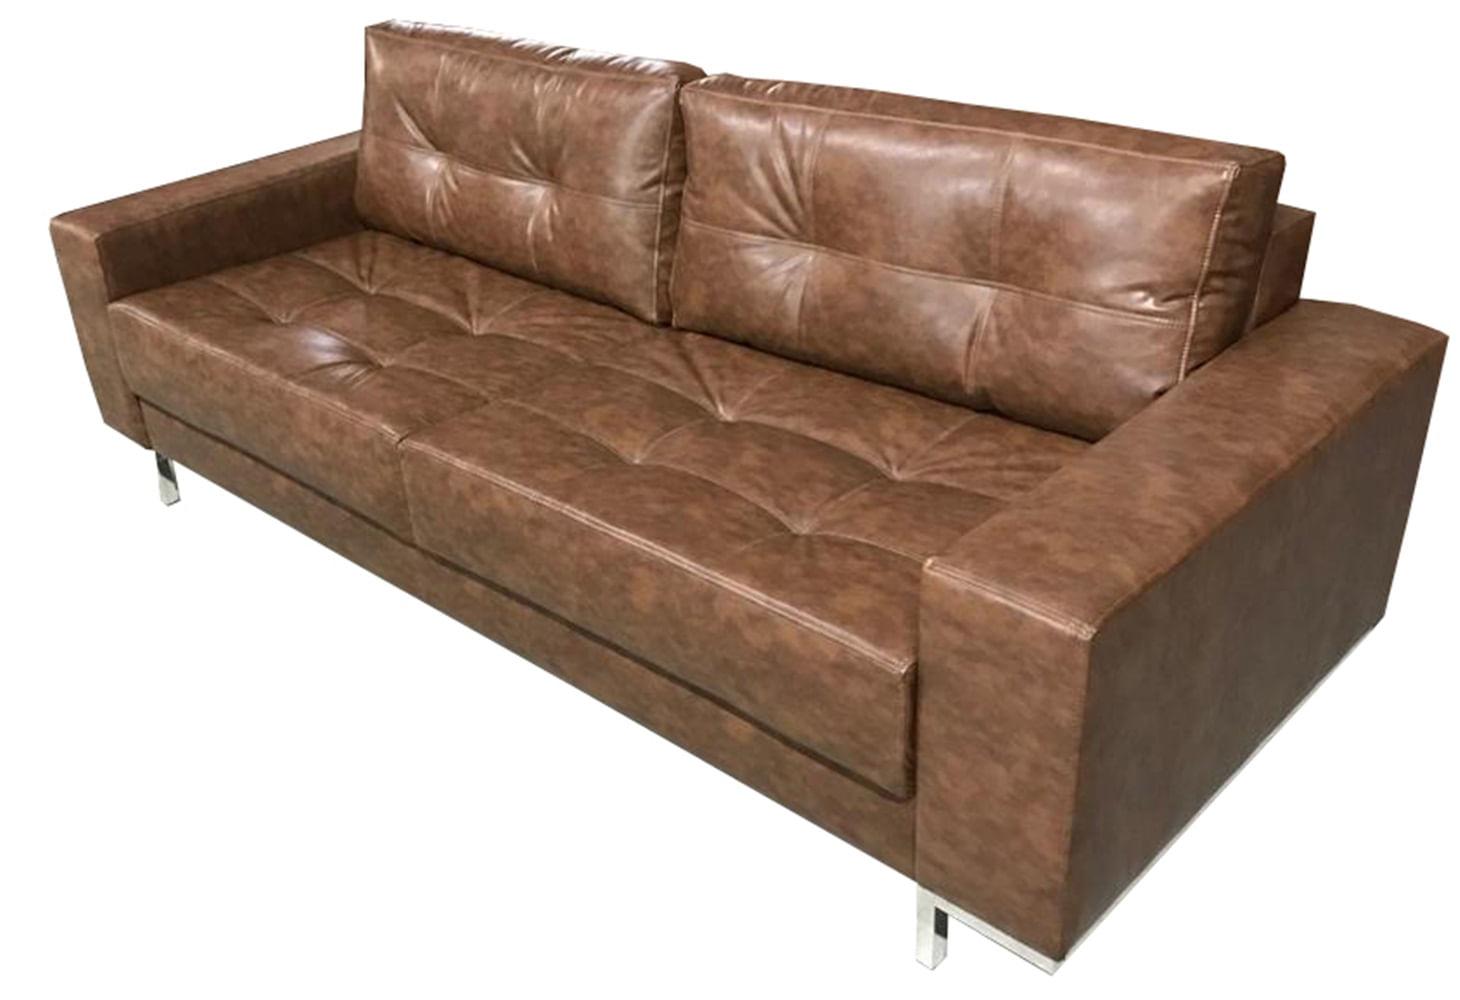 Sofa Fashion Courino Marrom Base Cromada 1,60 MT (LARG) - 51742